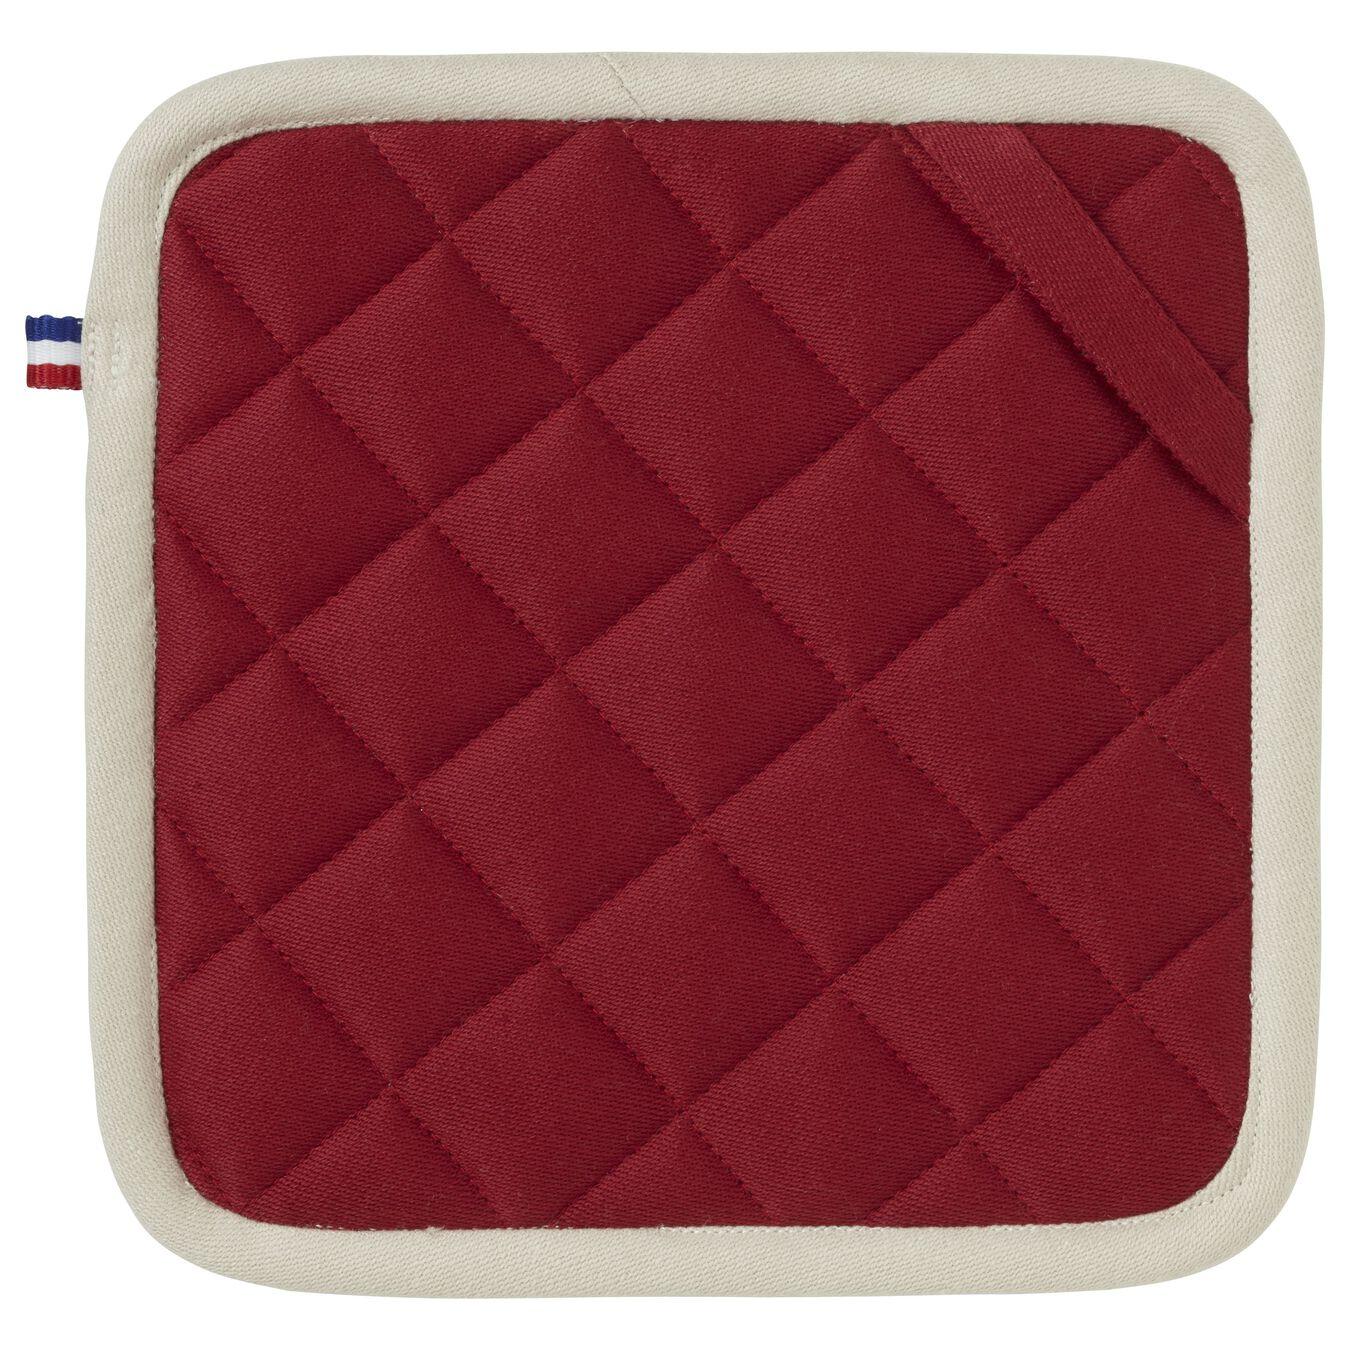 2 Piece 2 Piece Pot holder set, cherry,,large 2